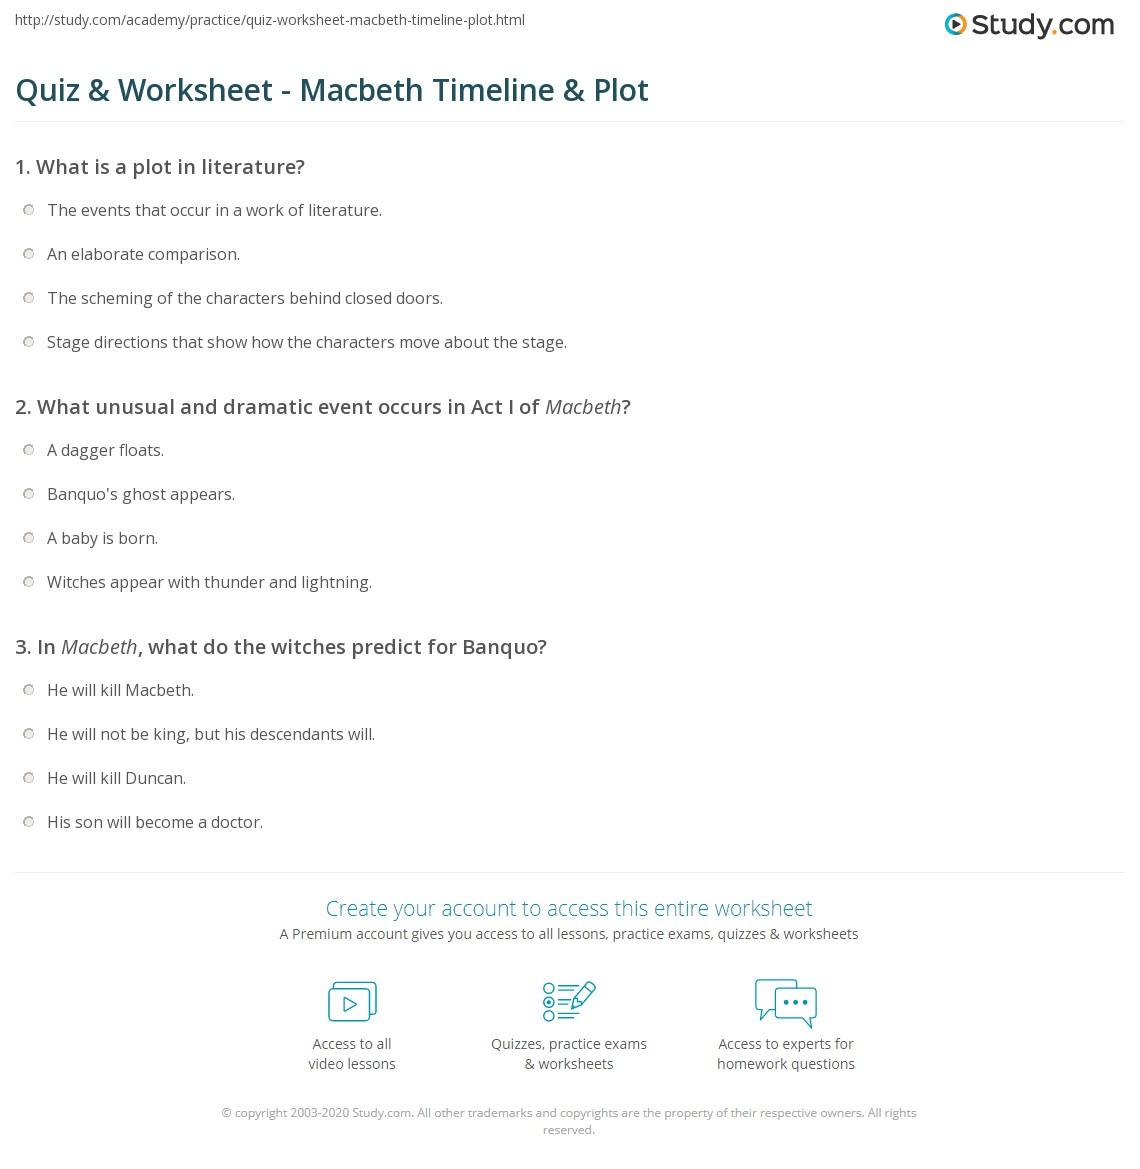 Quiz & Worksheet - Macbeth Timeline & Plot | Study.com